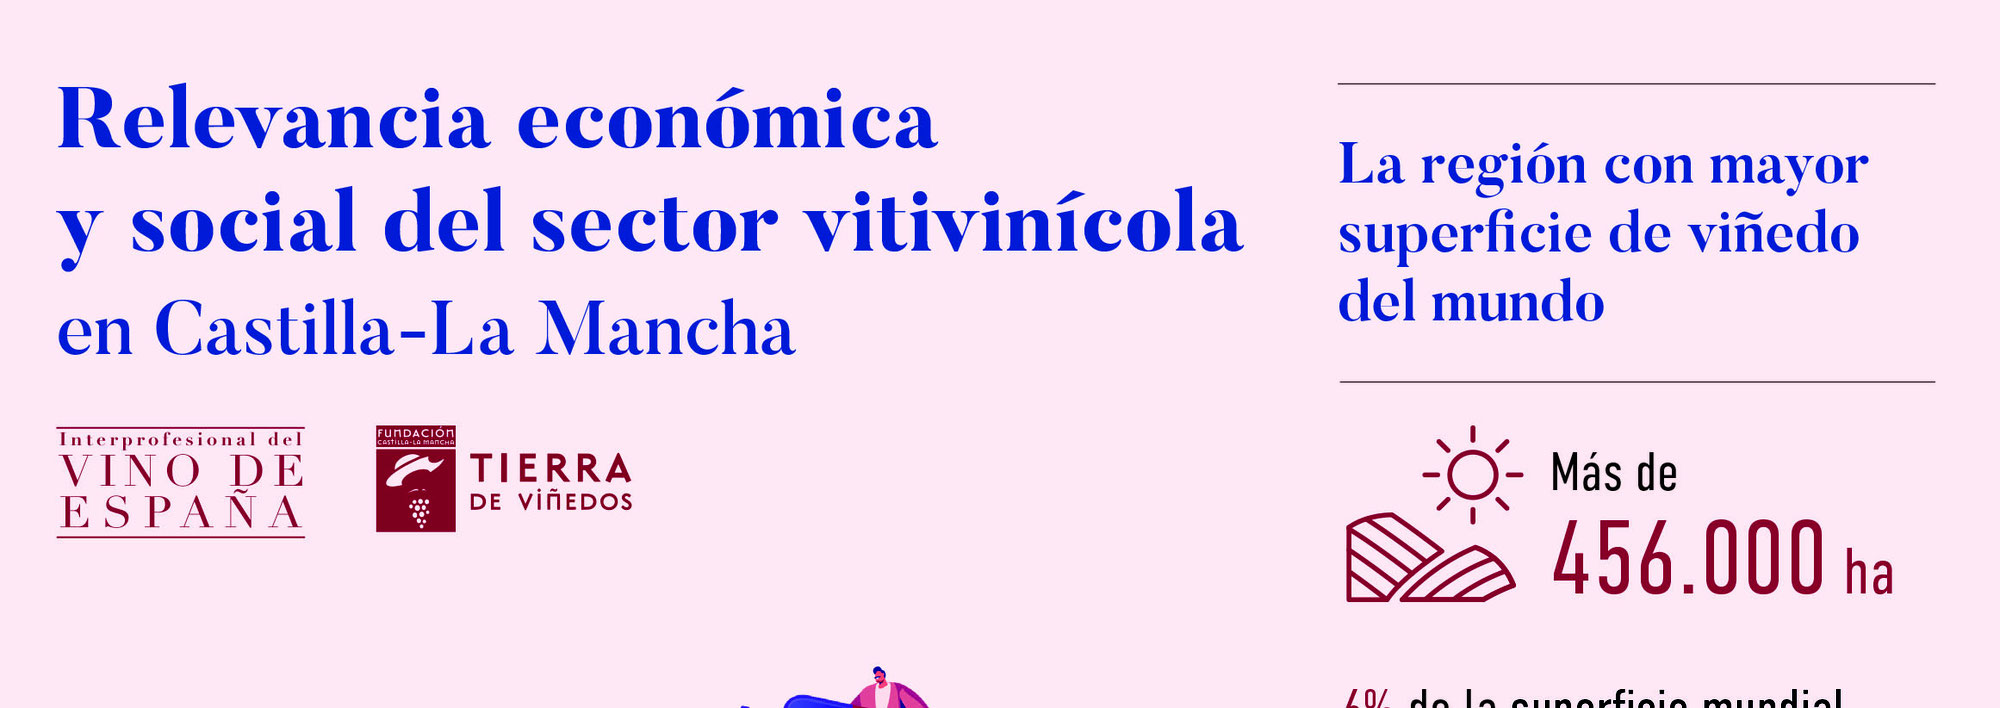 Estudio Importancia sector vitivinícola en Castilla-La Mancha